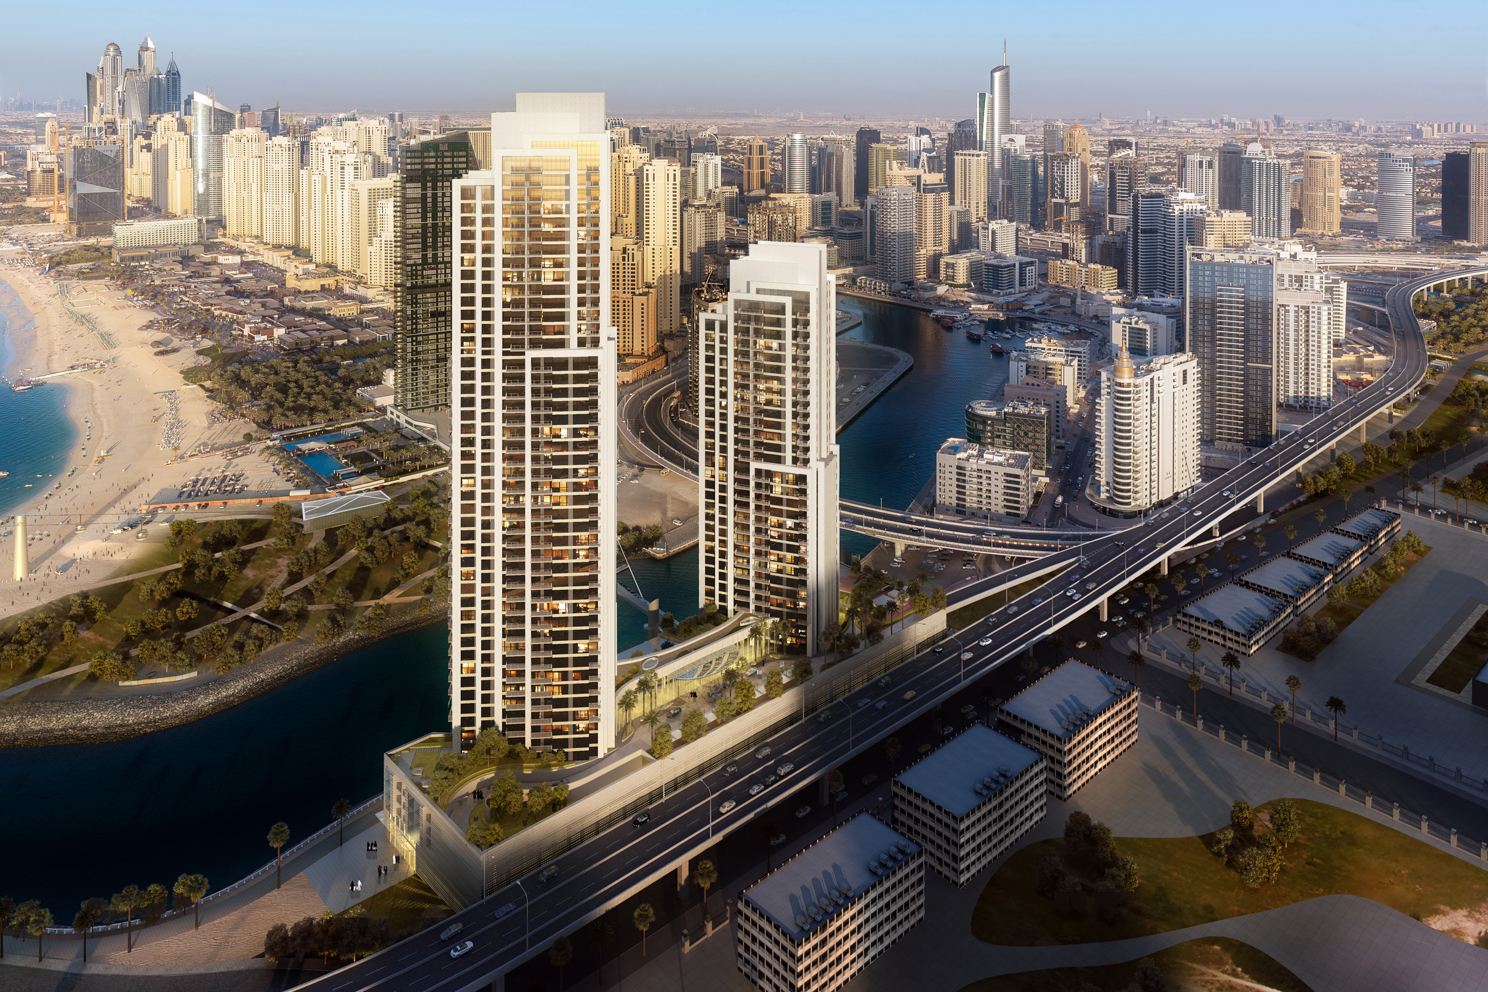 Dreamhouse Floor Plans Blueprints furthermore H2 Kawasaki Ninja 2015 together with Jbr Dubai Marina also Arabian Ranches Floor Plans additionally Hotel With Kitche te Room. on 4 bedroom floor plans